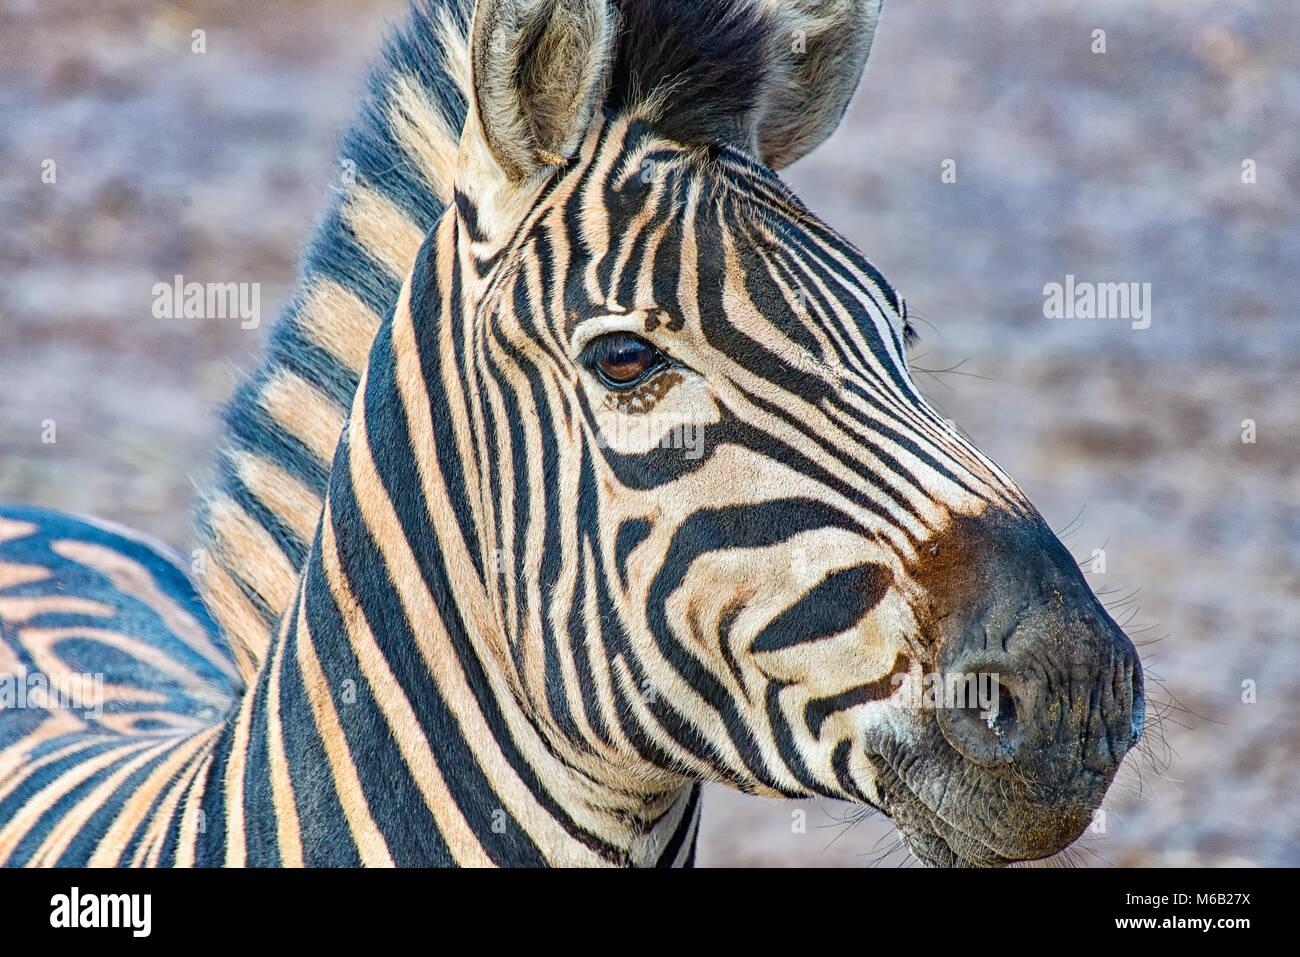 Kopf eines Zebras Stockfoto